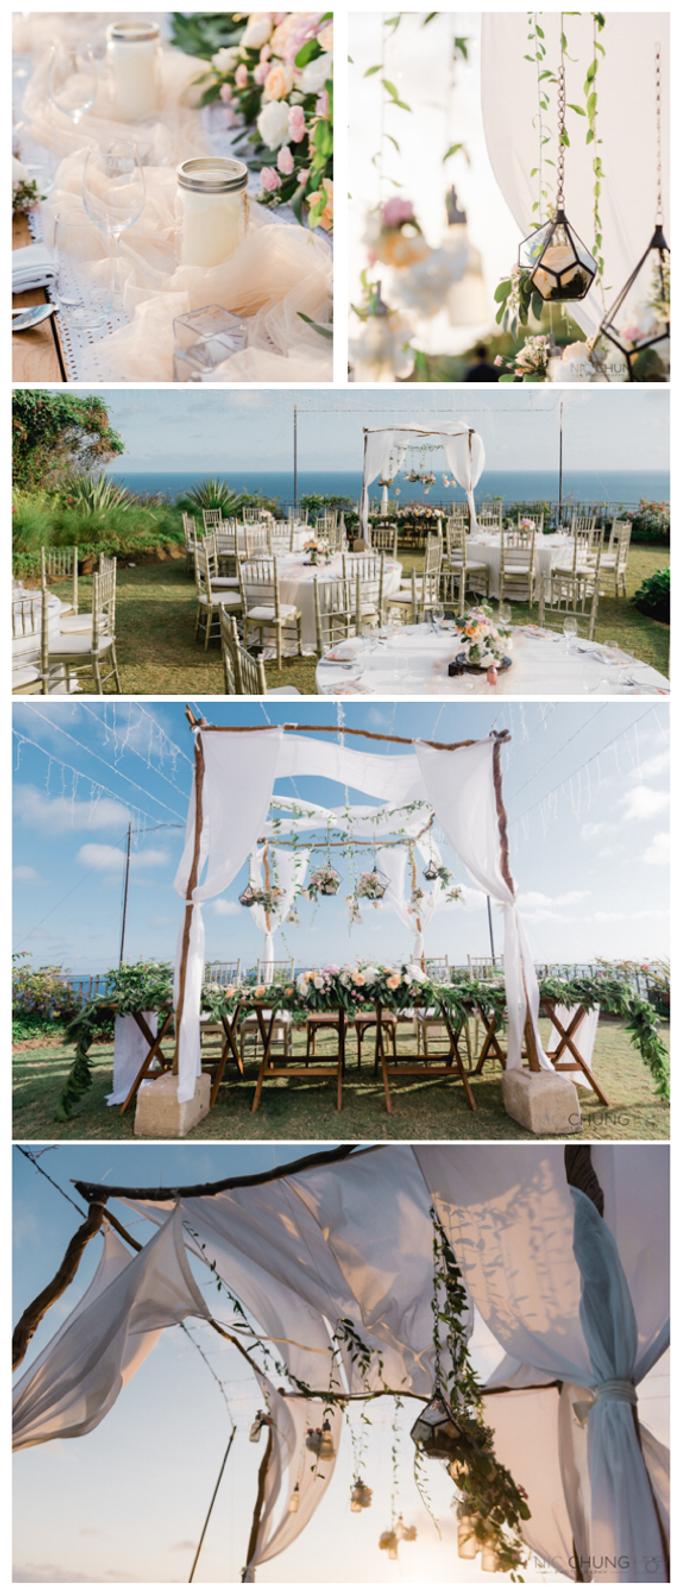 Bali wedding day by Nic Chung Photography - 003